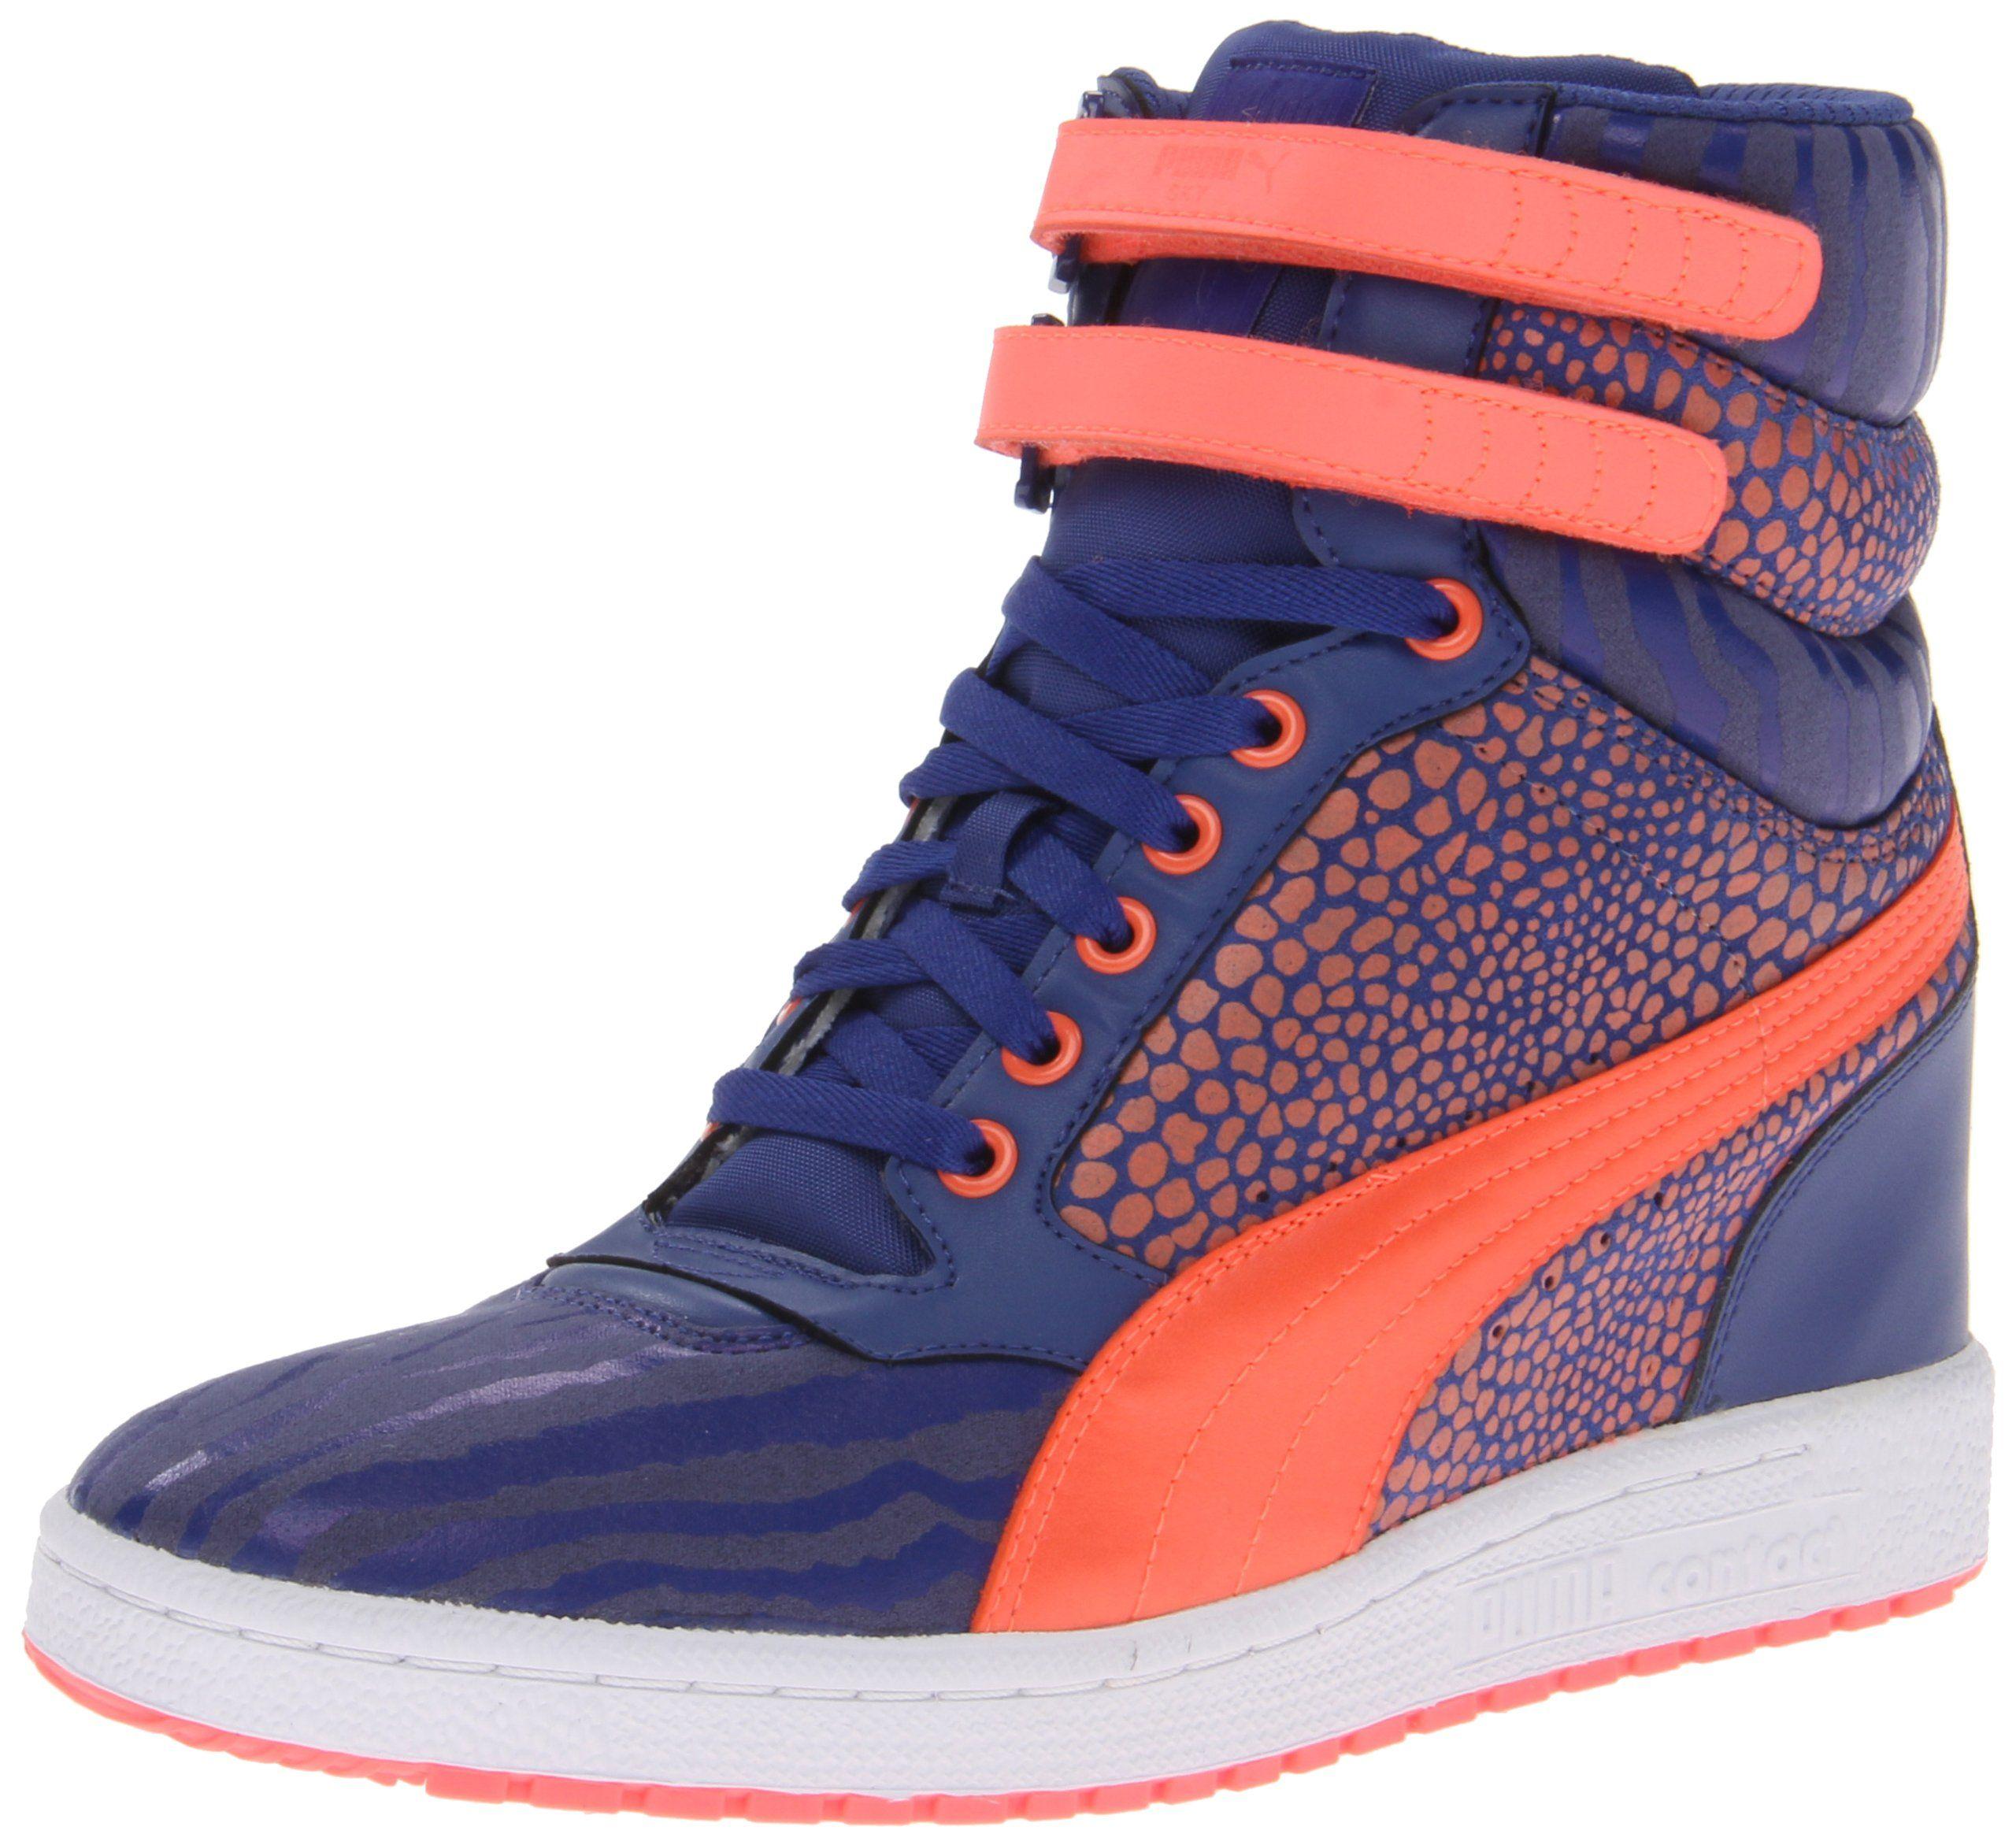 Amazon.com: PUMA Women's Sky Wedge Reptile Fashion Sneaker, Black, 8.5 B